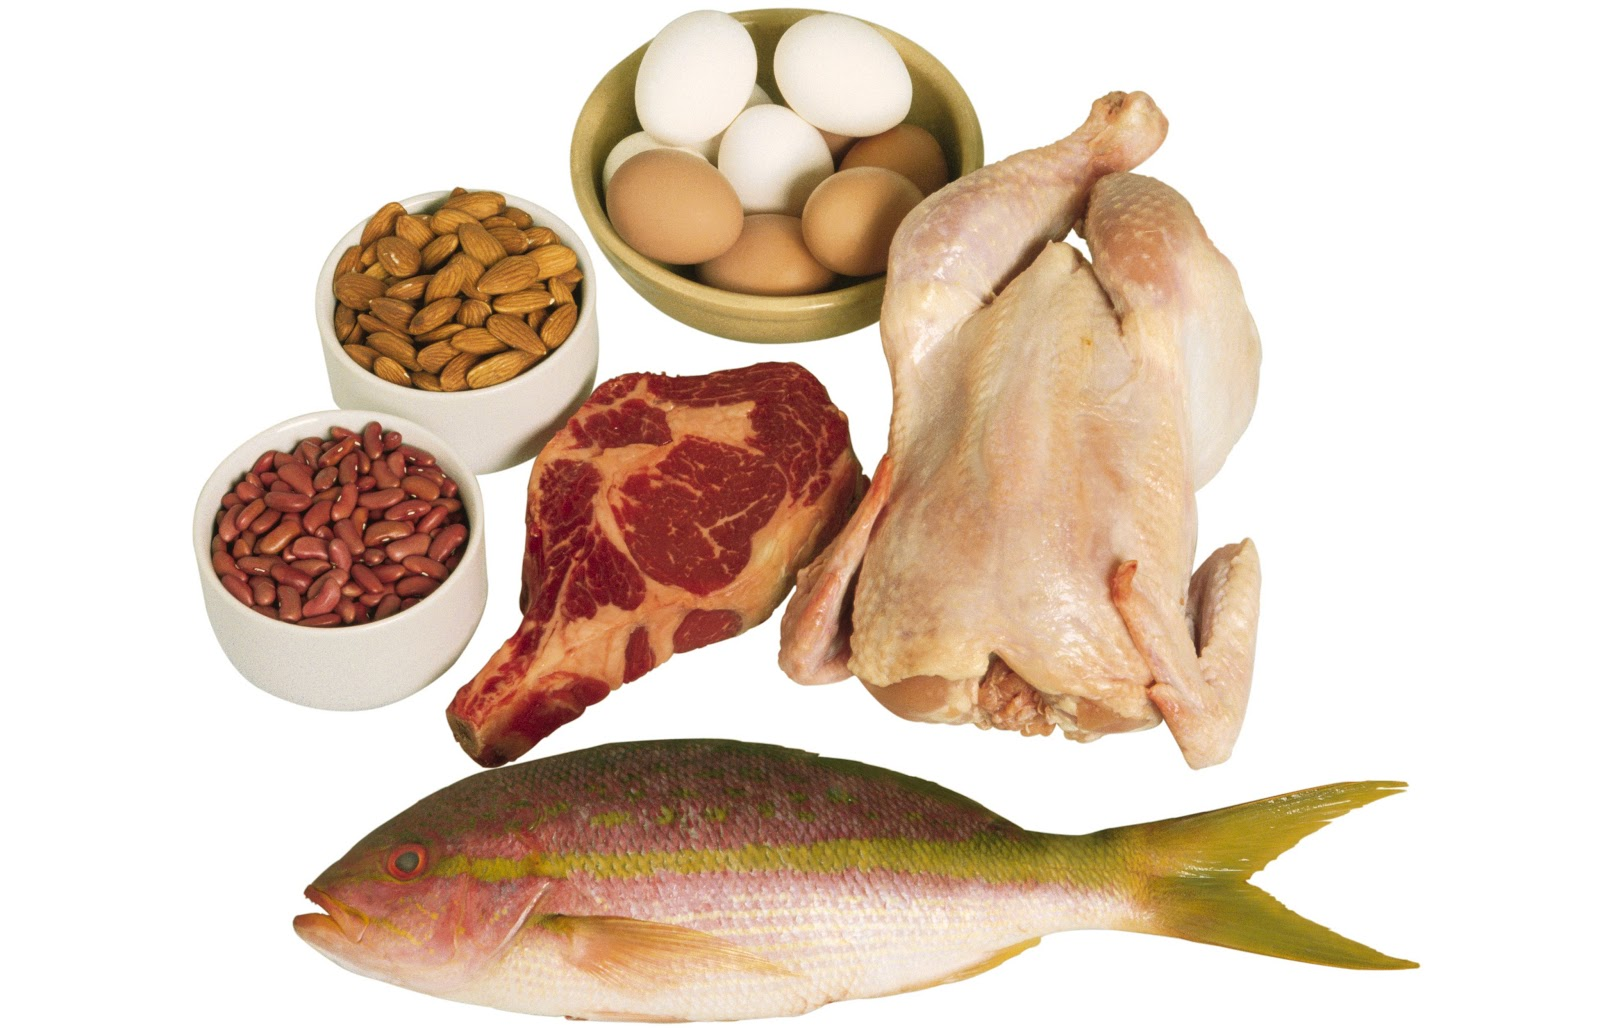 Webquest Healthy Eating Practices